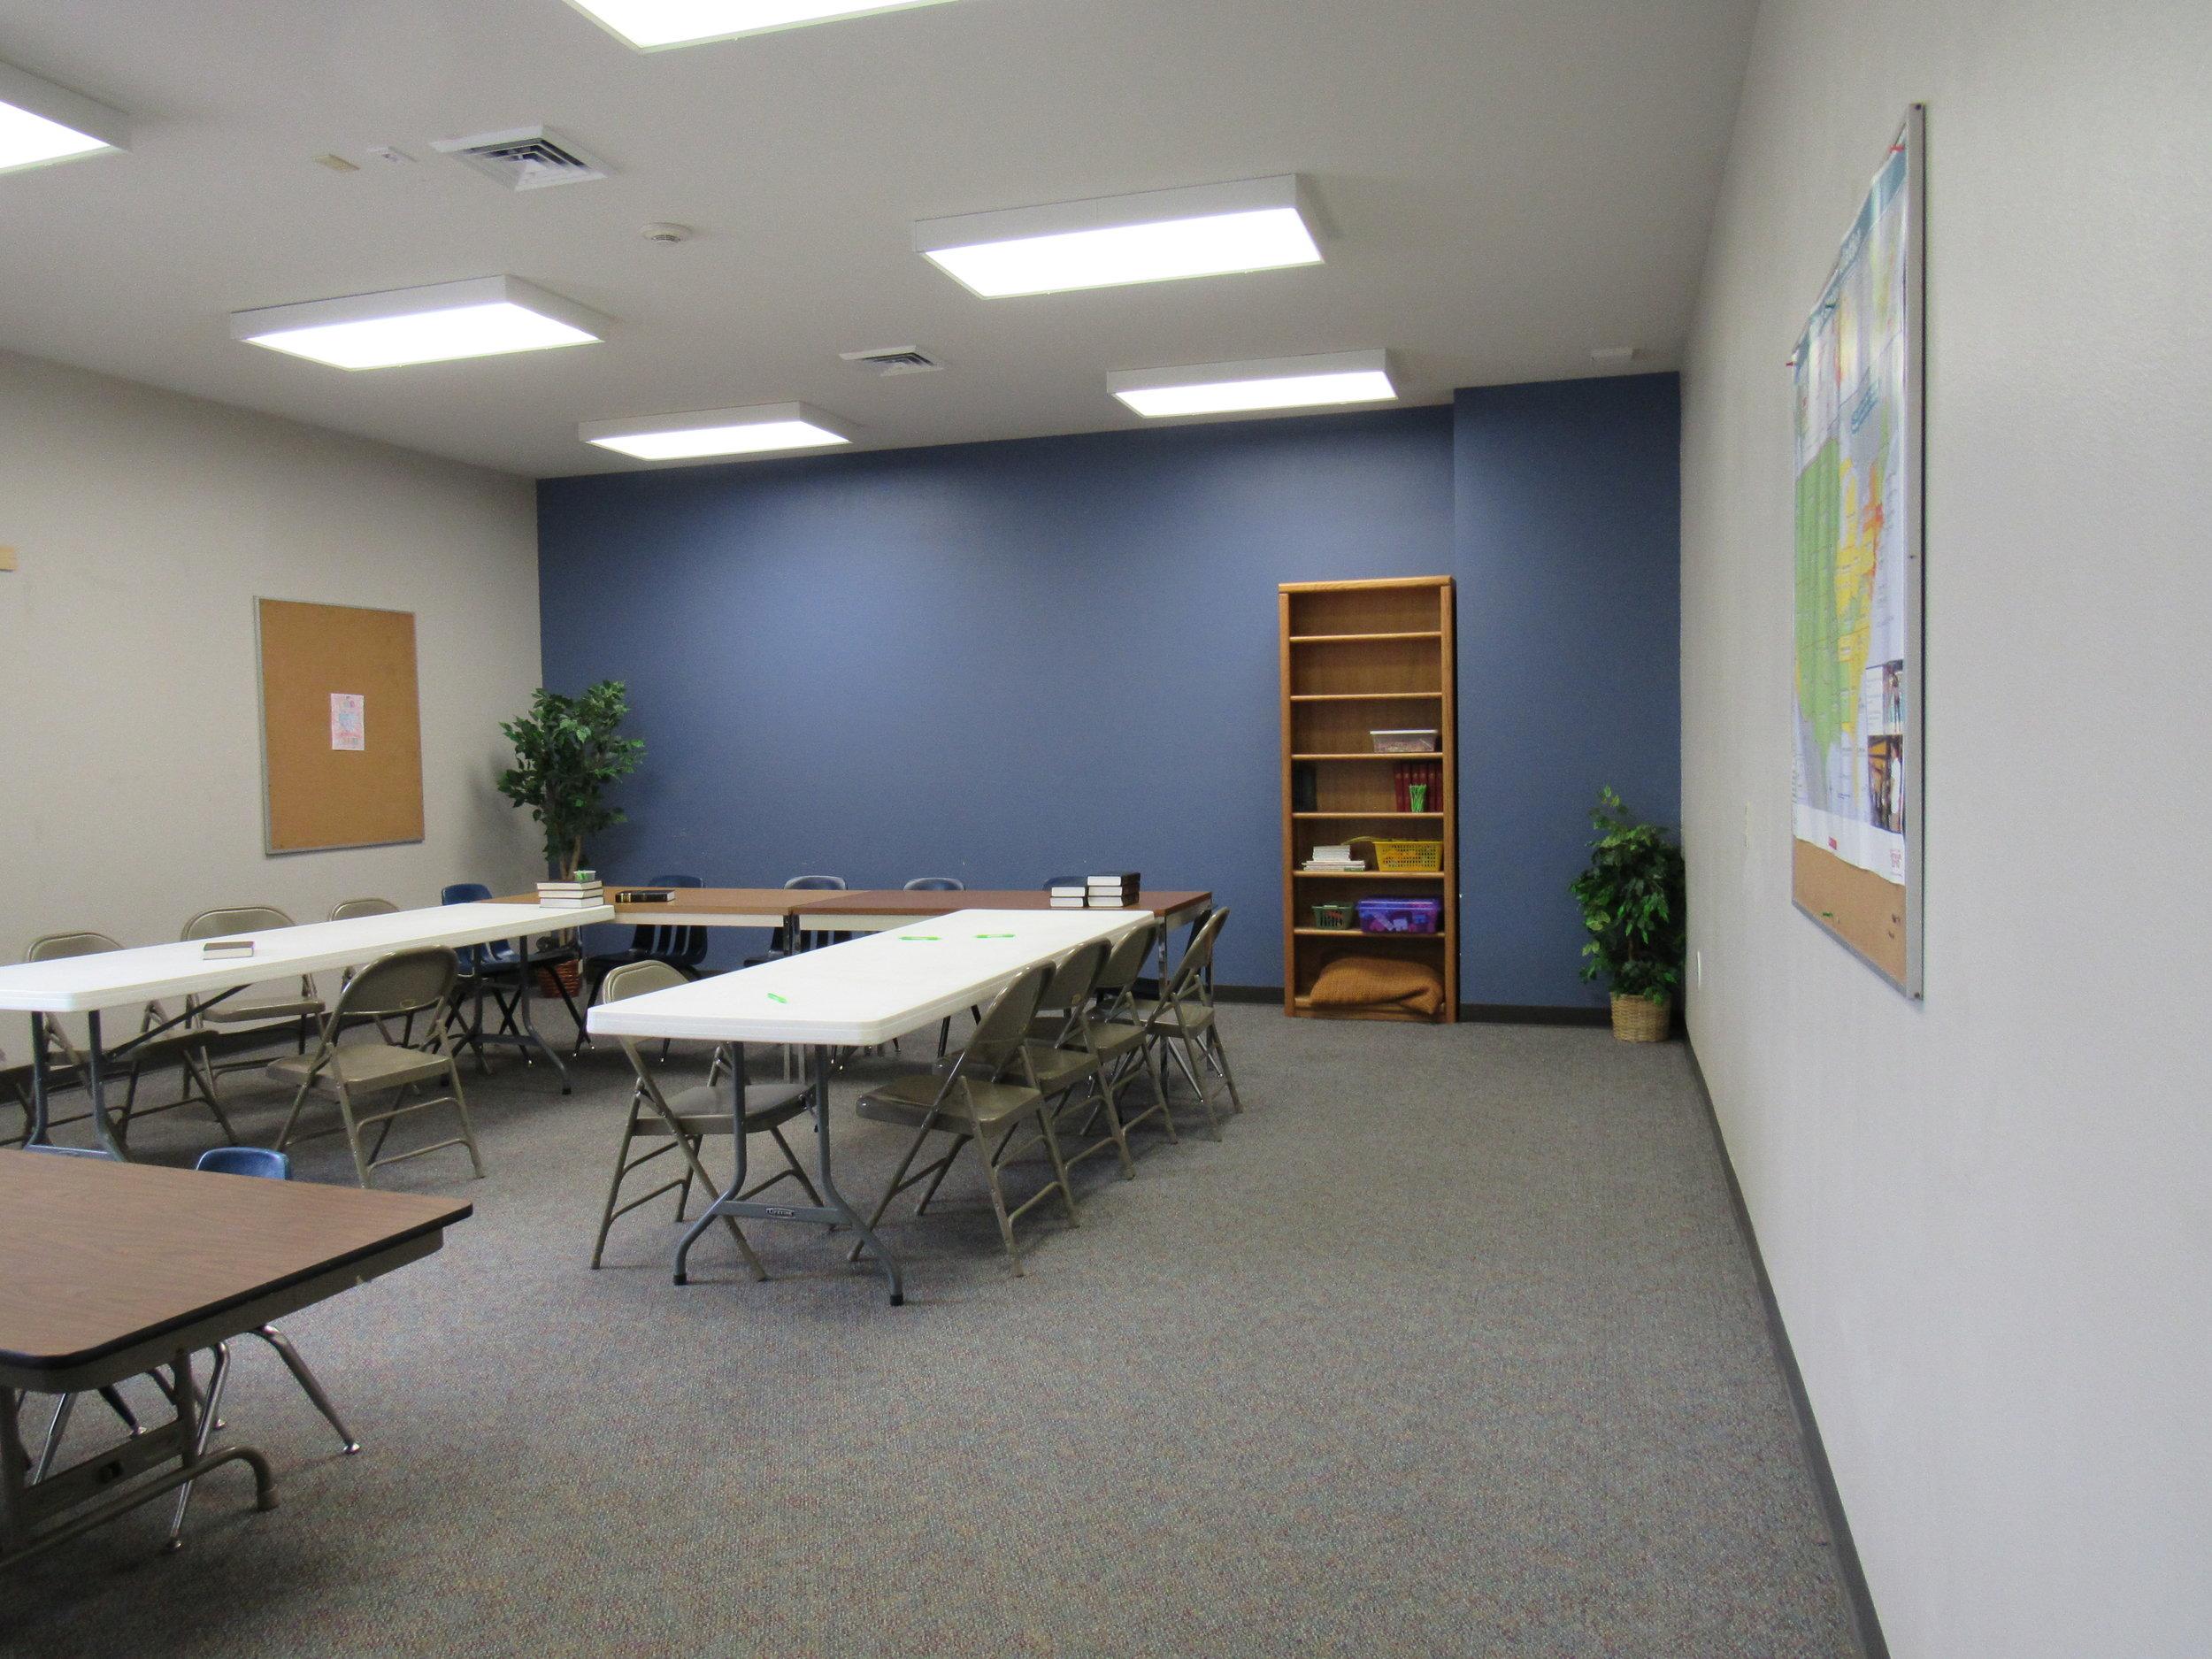 The Blue Classroom